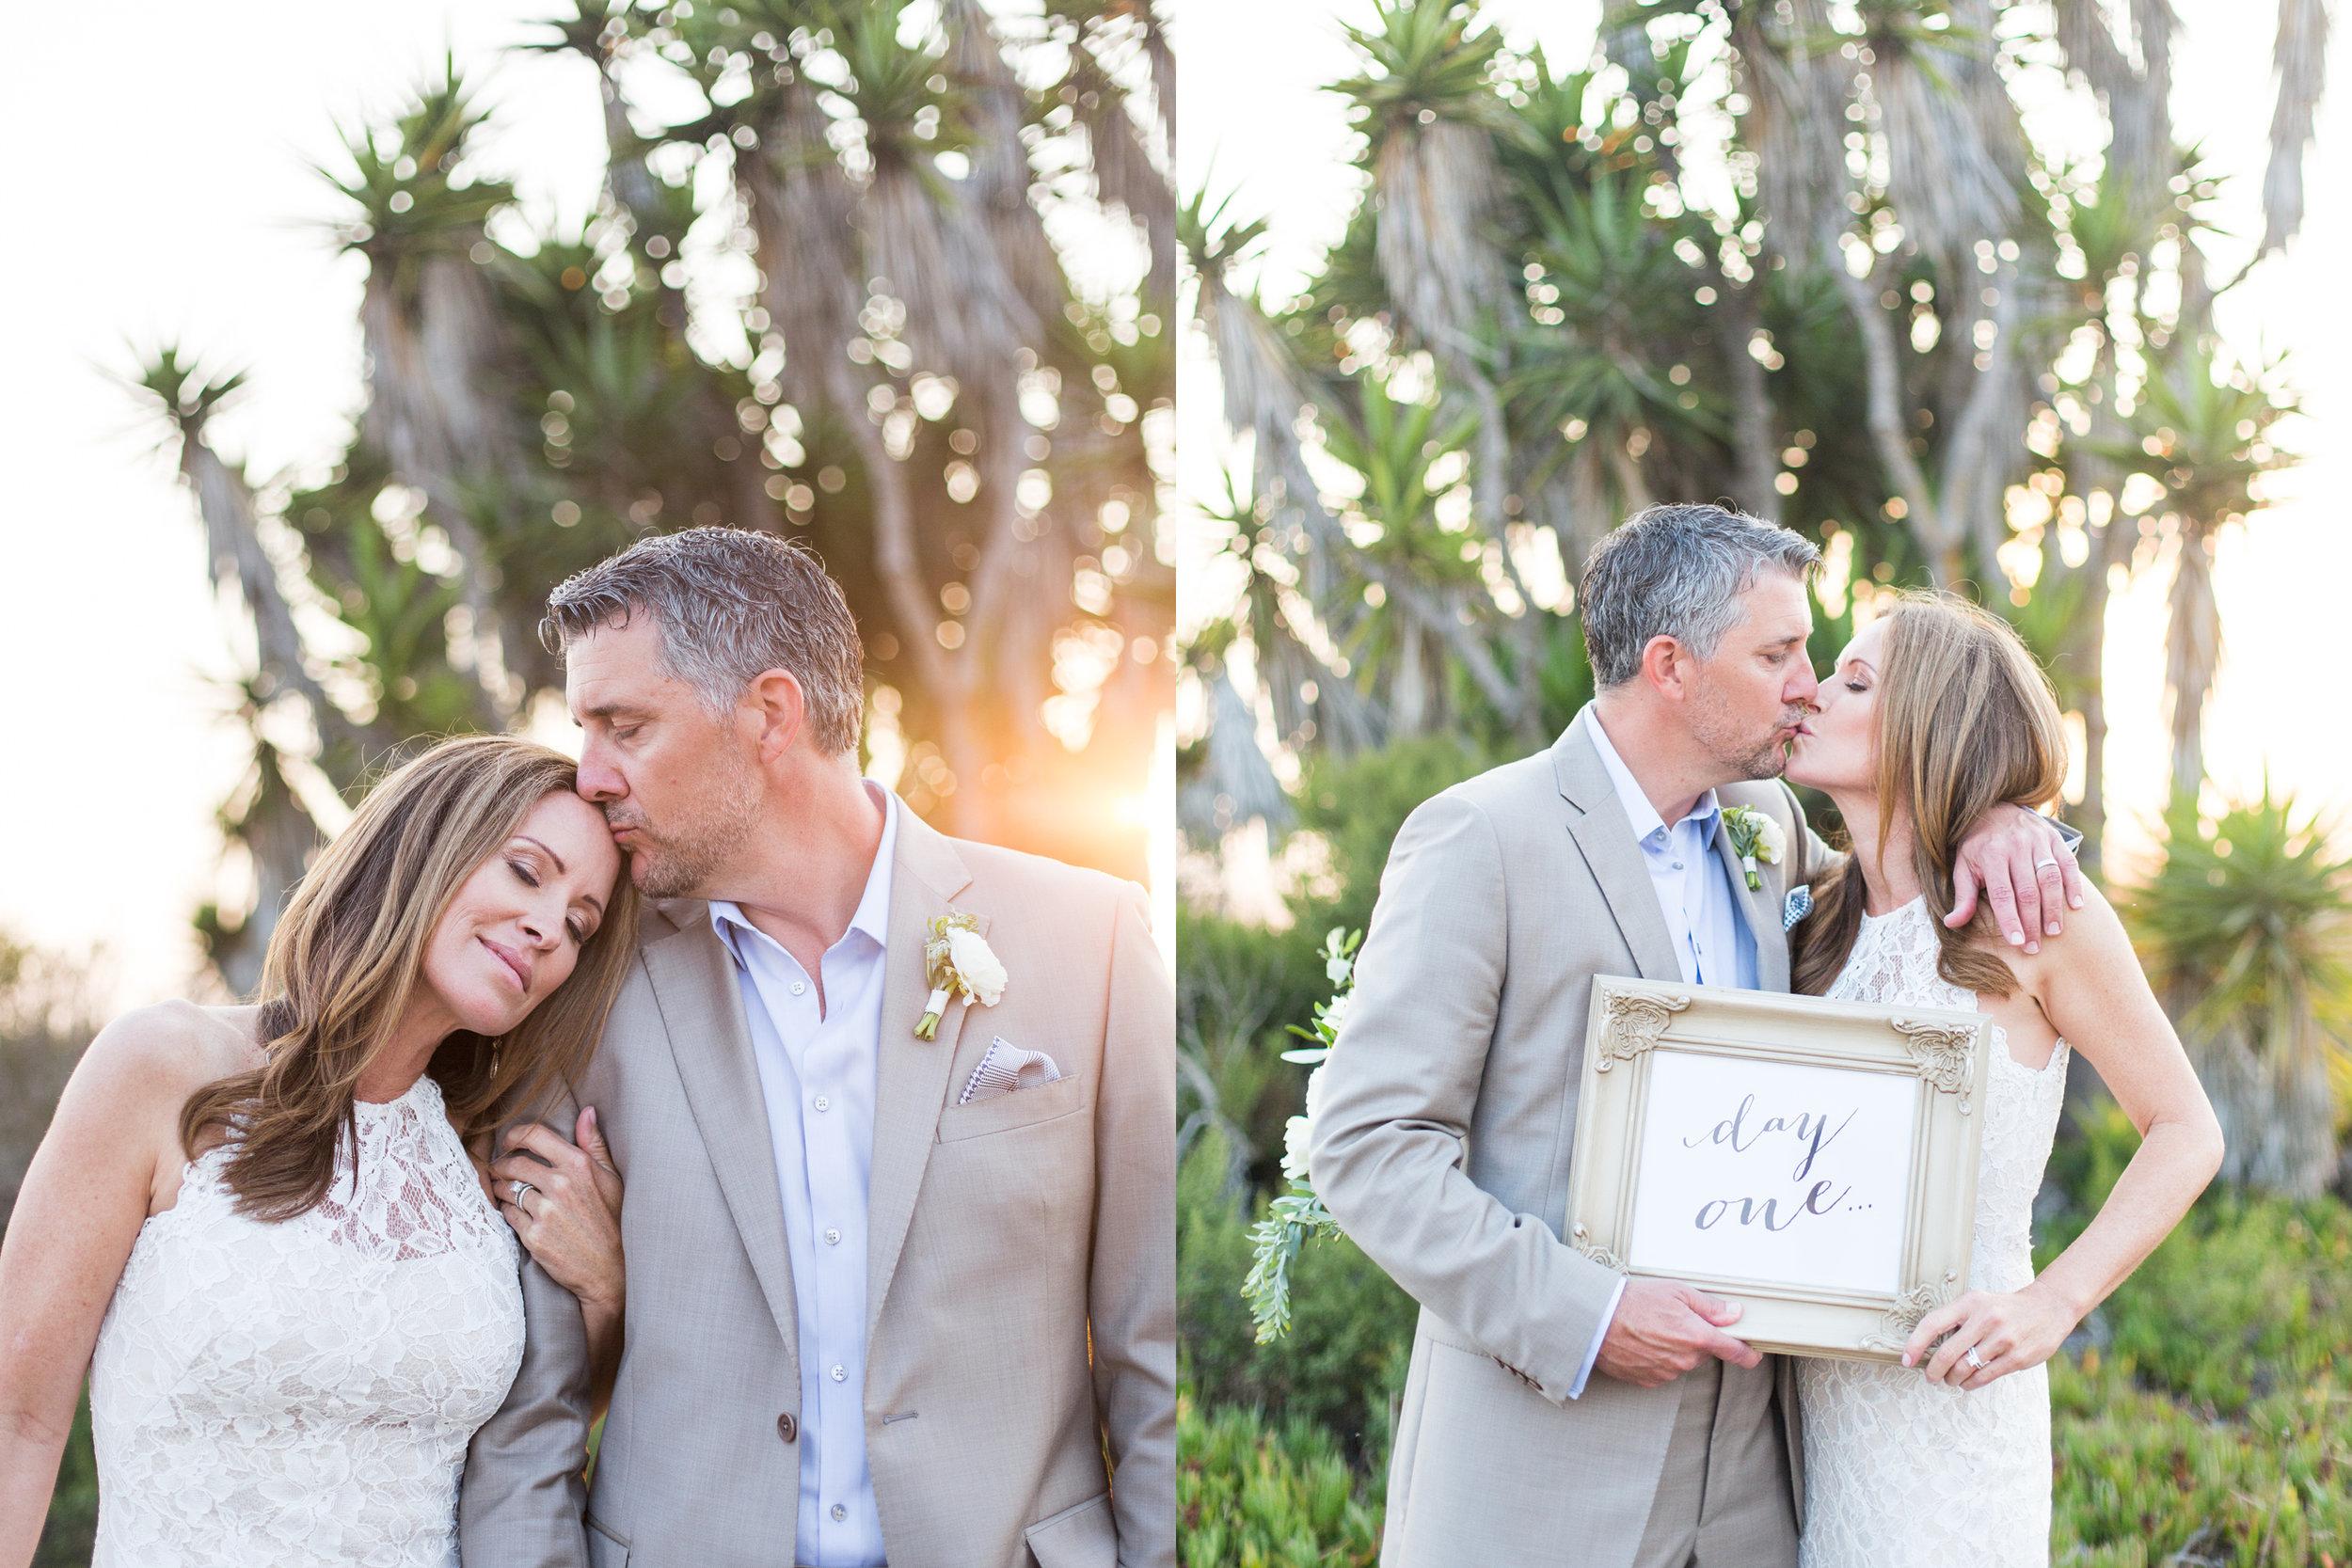 santa-barbara-elopement-elope-wedding-planner-coordinator-coordination-day-of-intimate-rustic-ellwood-bluffs-forest-beach-ocean-view-green-white-event (16).jpg